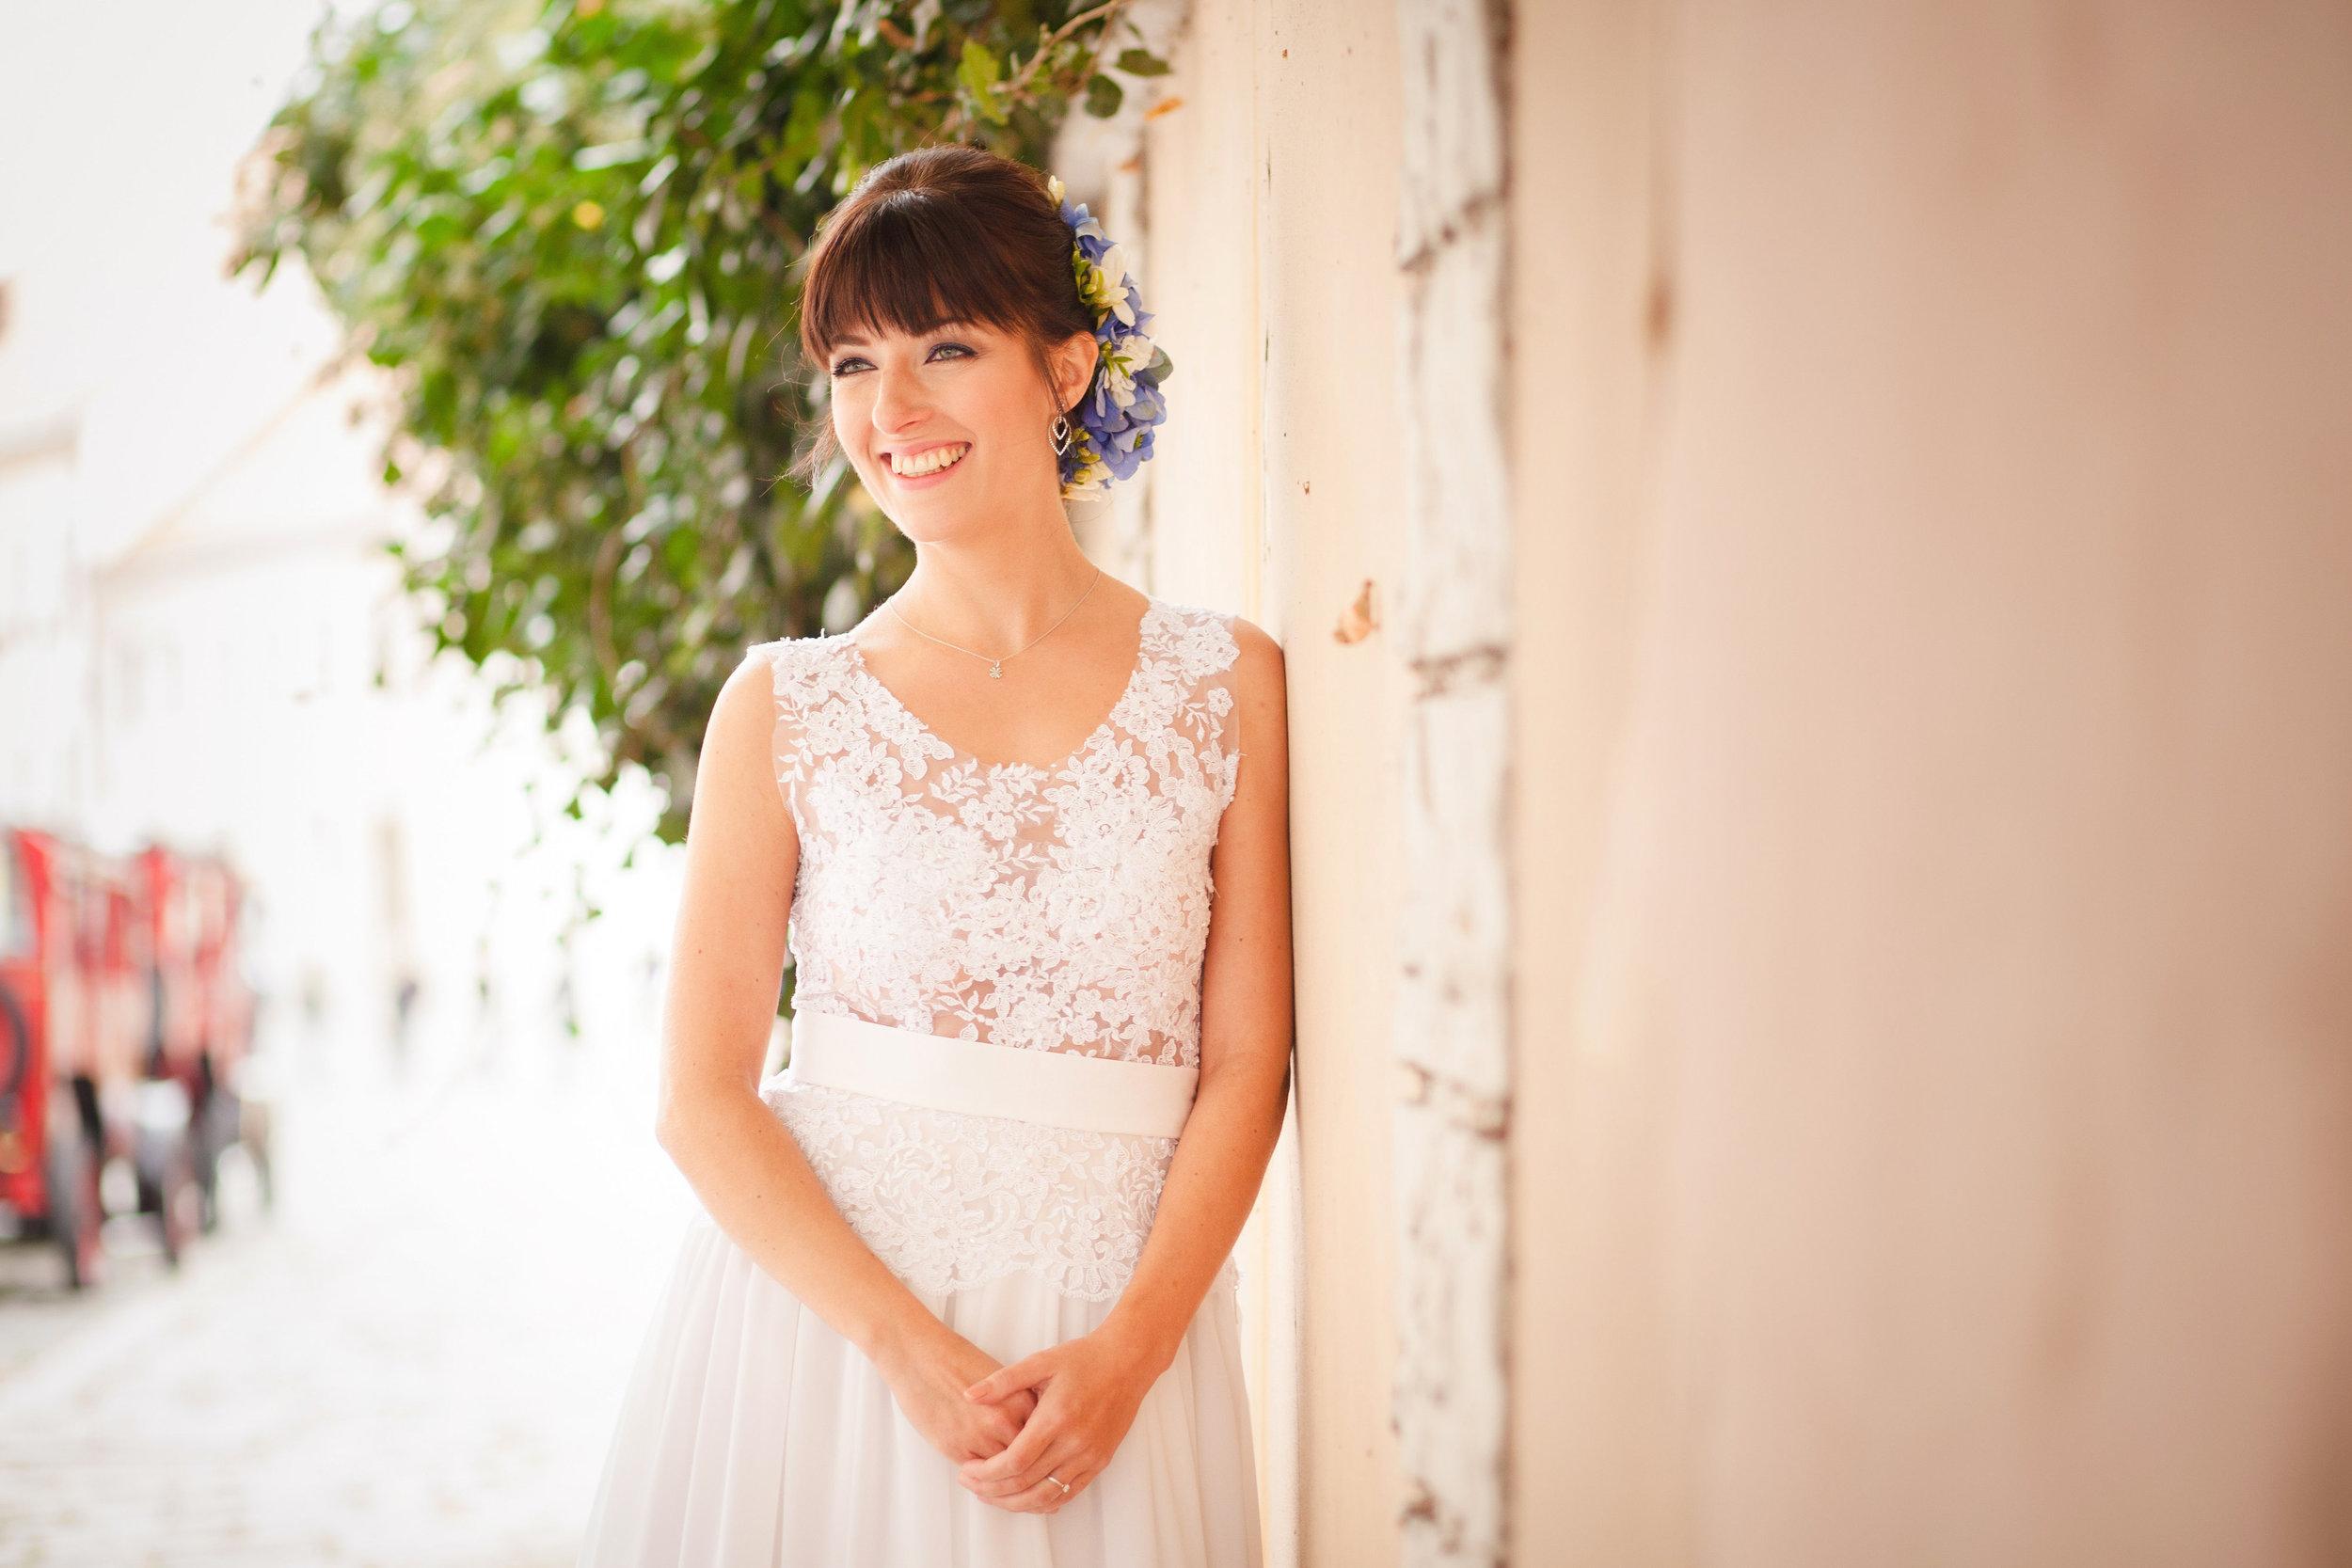 destination-wedding-photographer-bratislava-slovakia-europe-portrait-session-bride.jpg